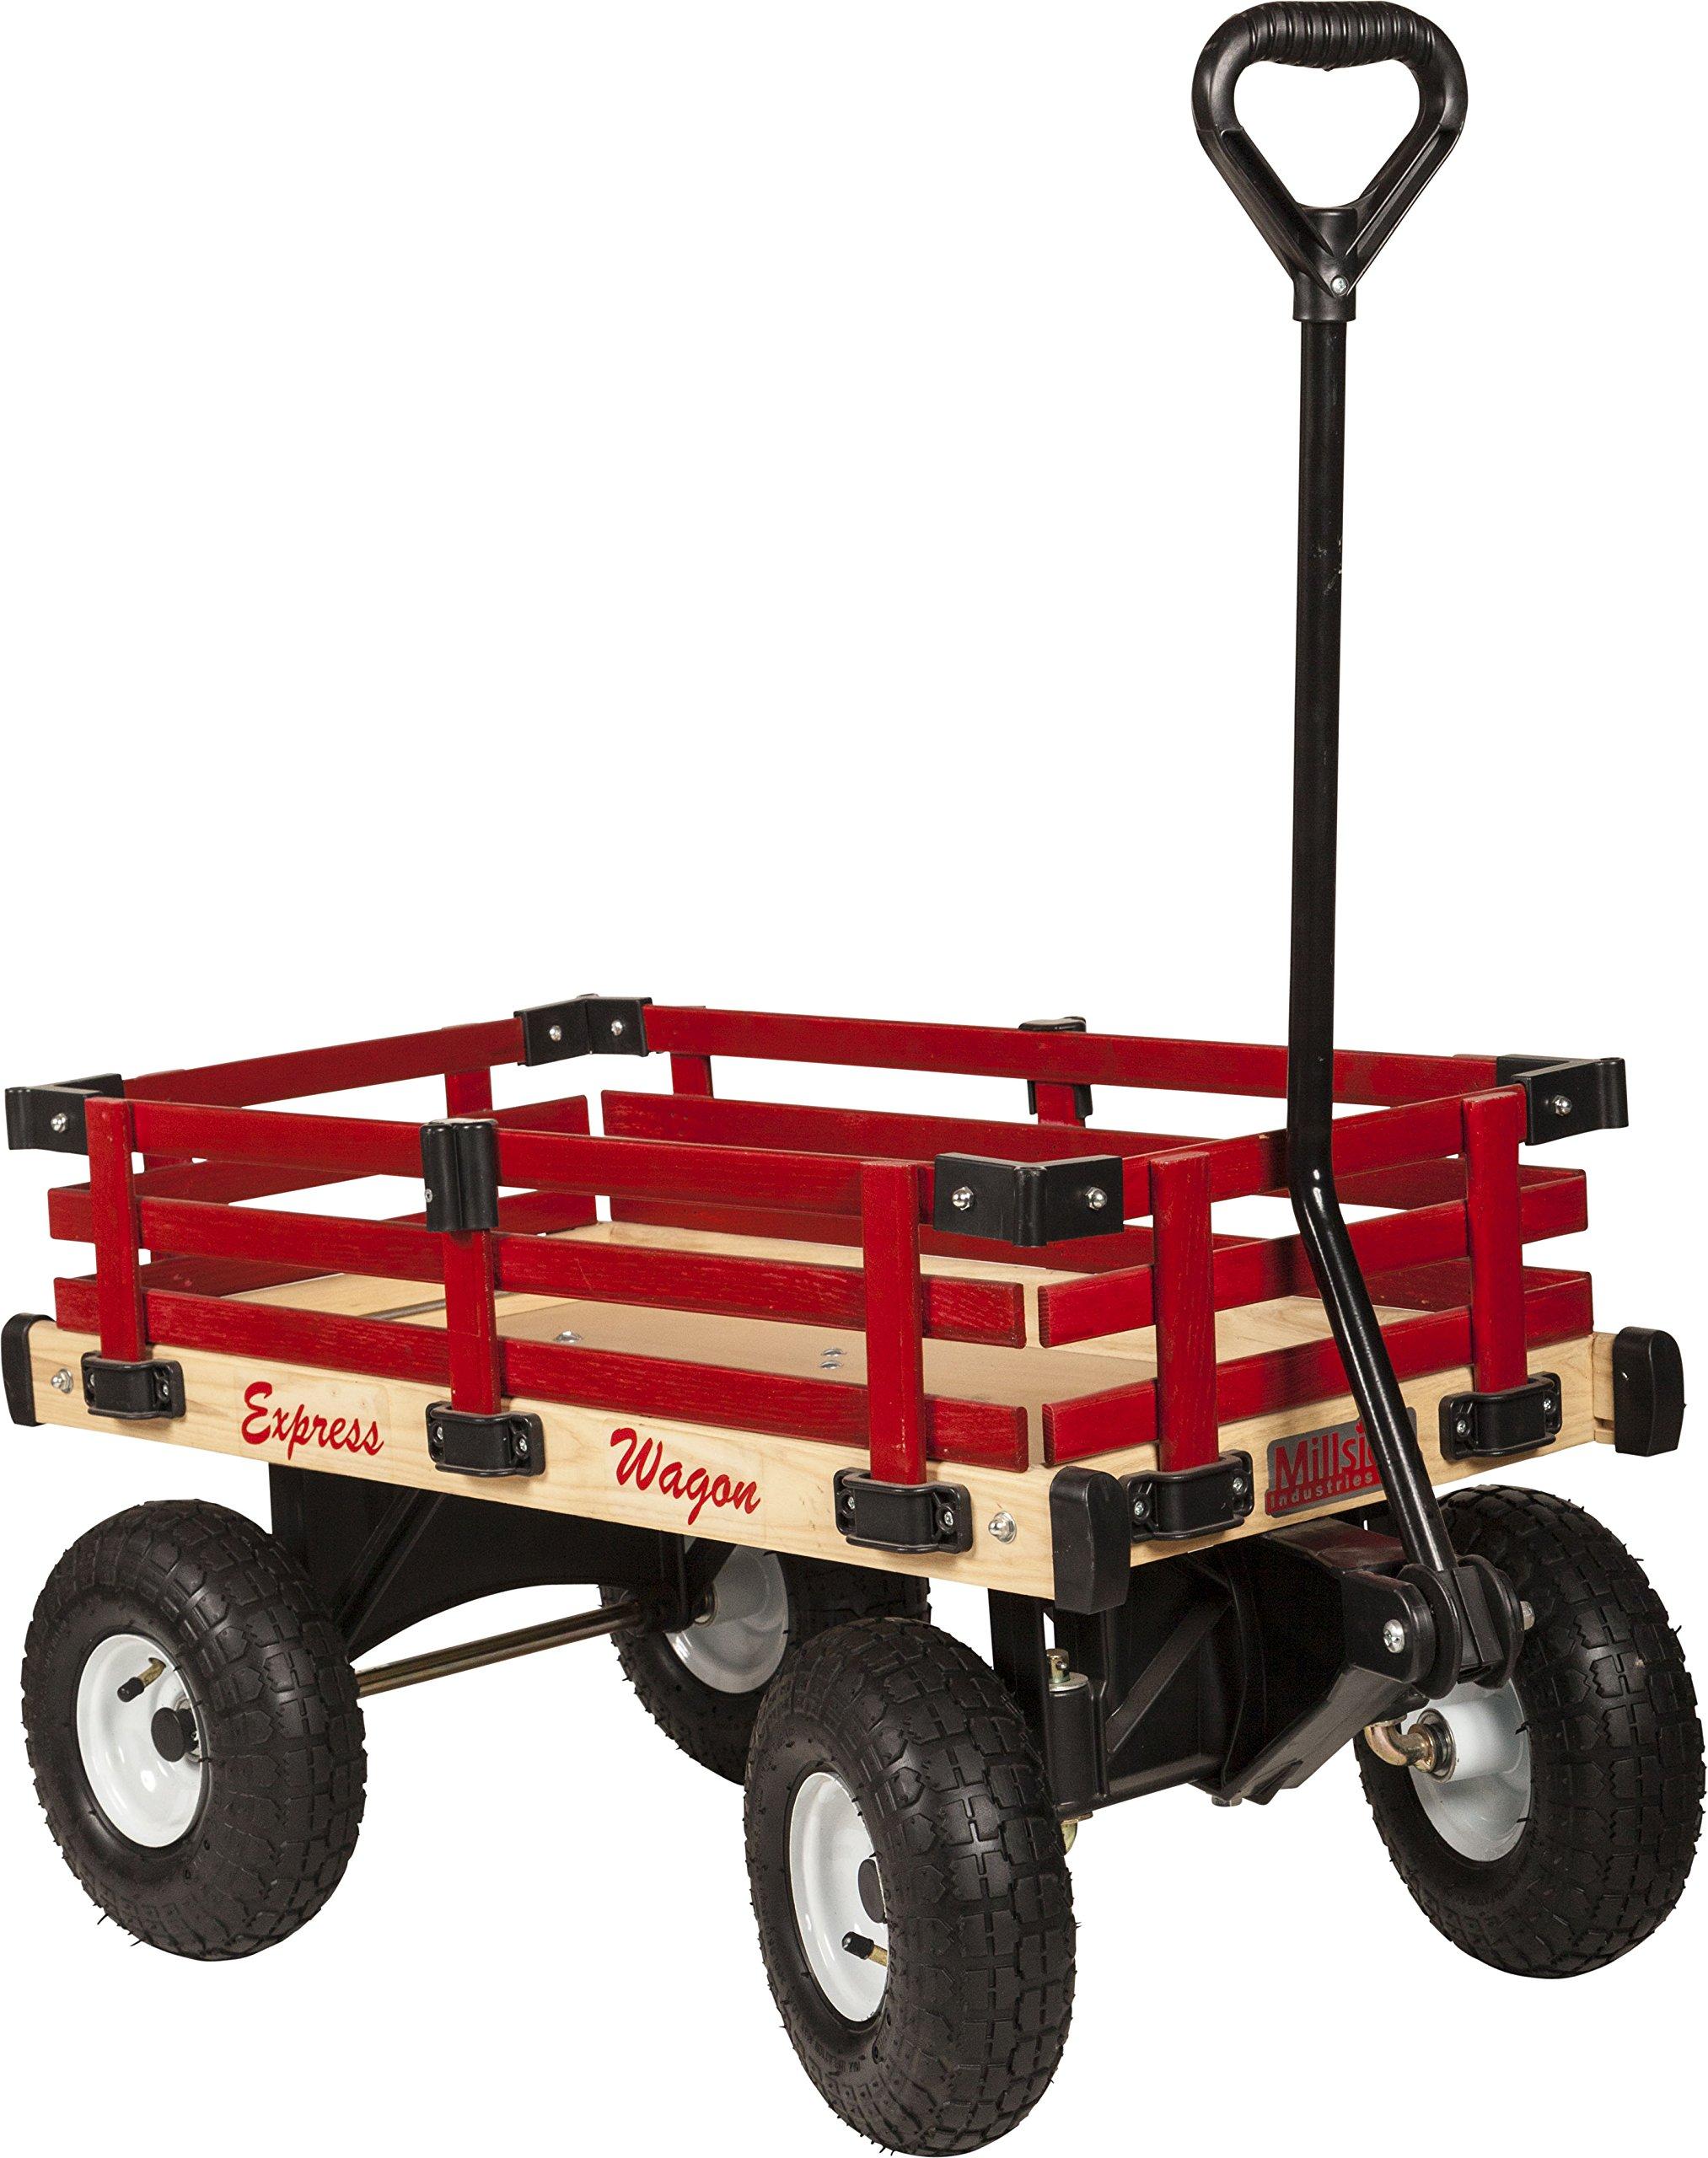 16'' X 34'' Millside Industries Wooden Express Wagon